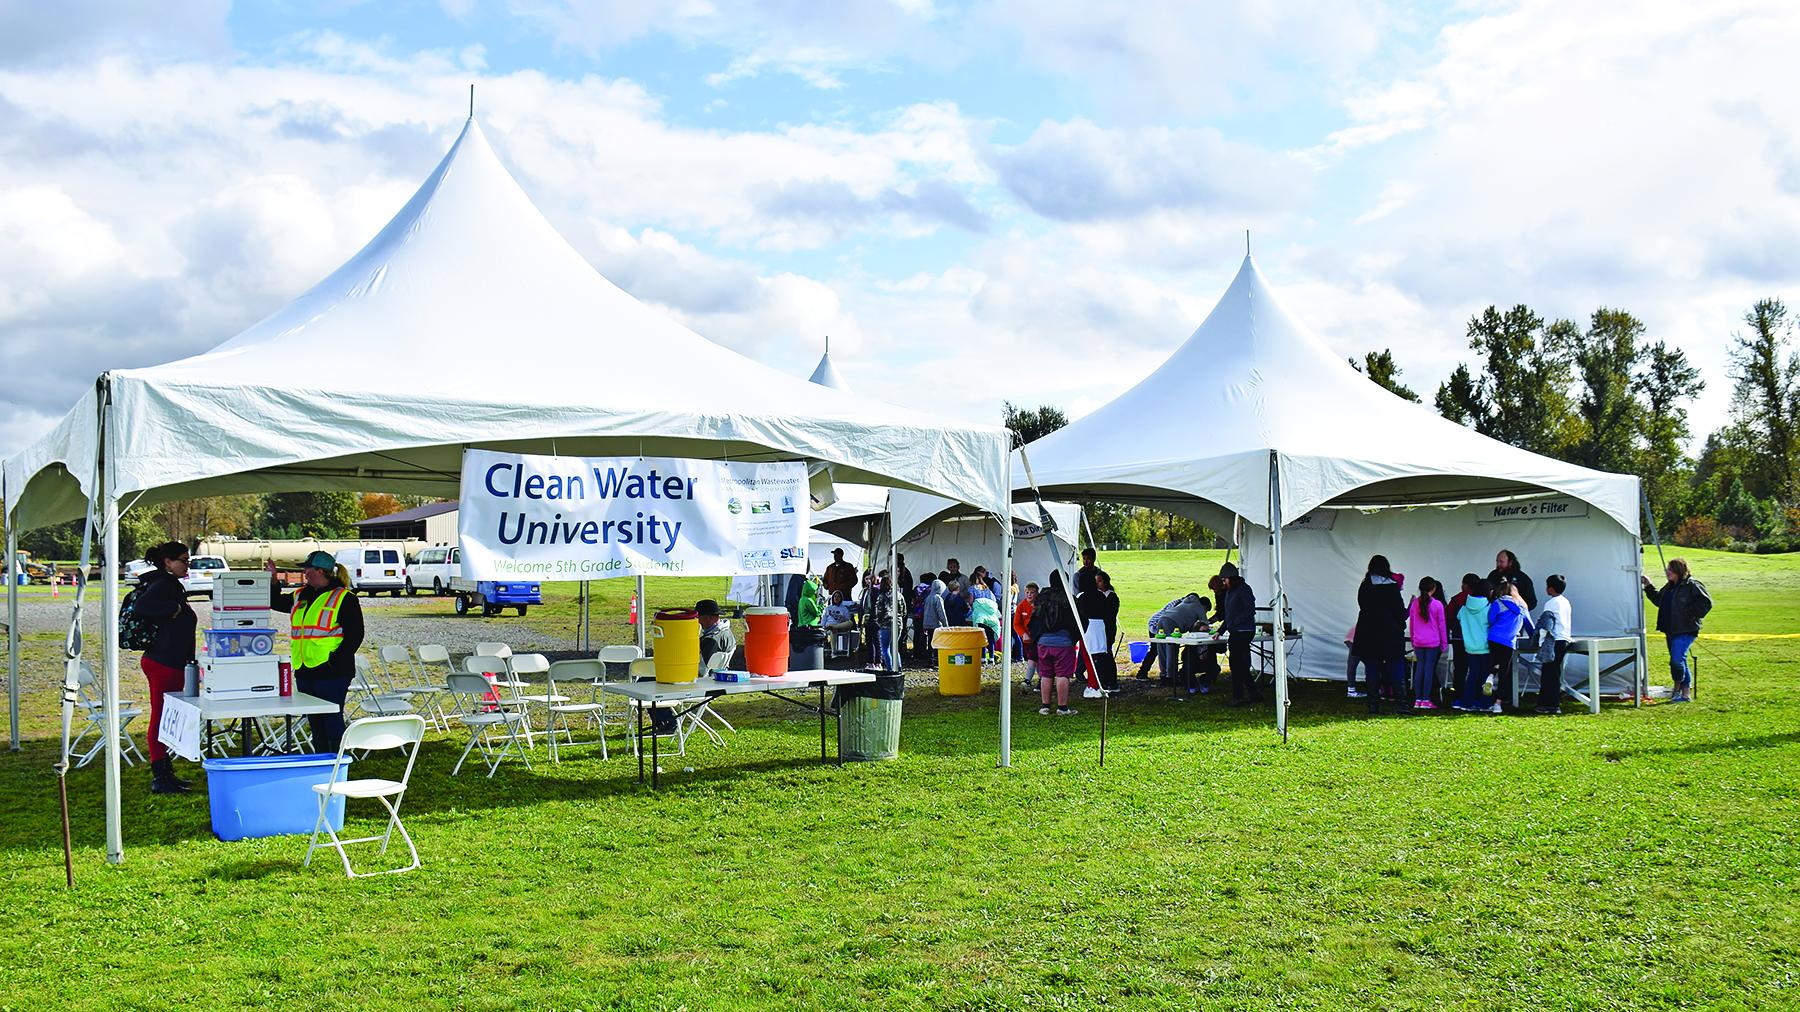 Clean Water University Field Trip Overview